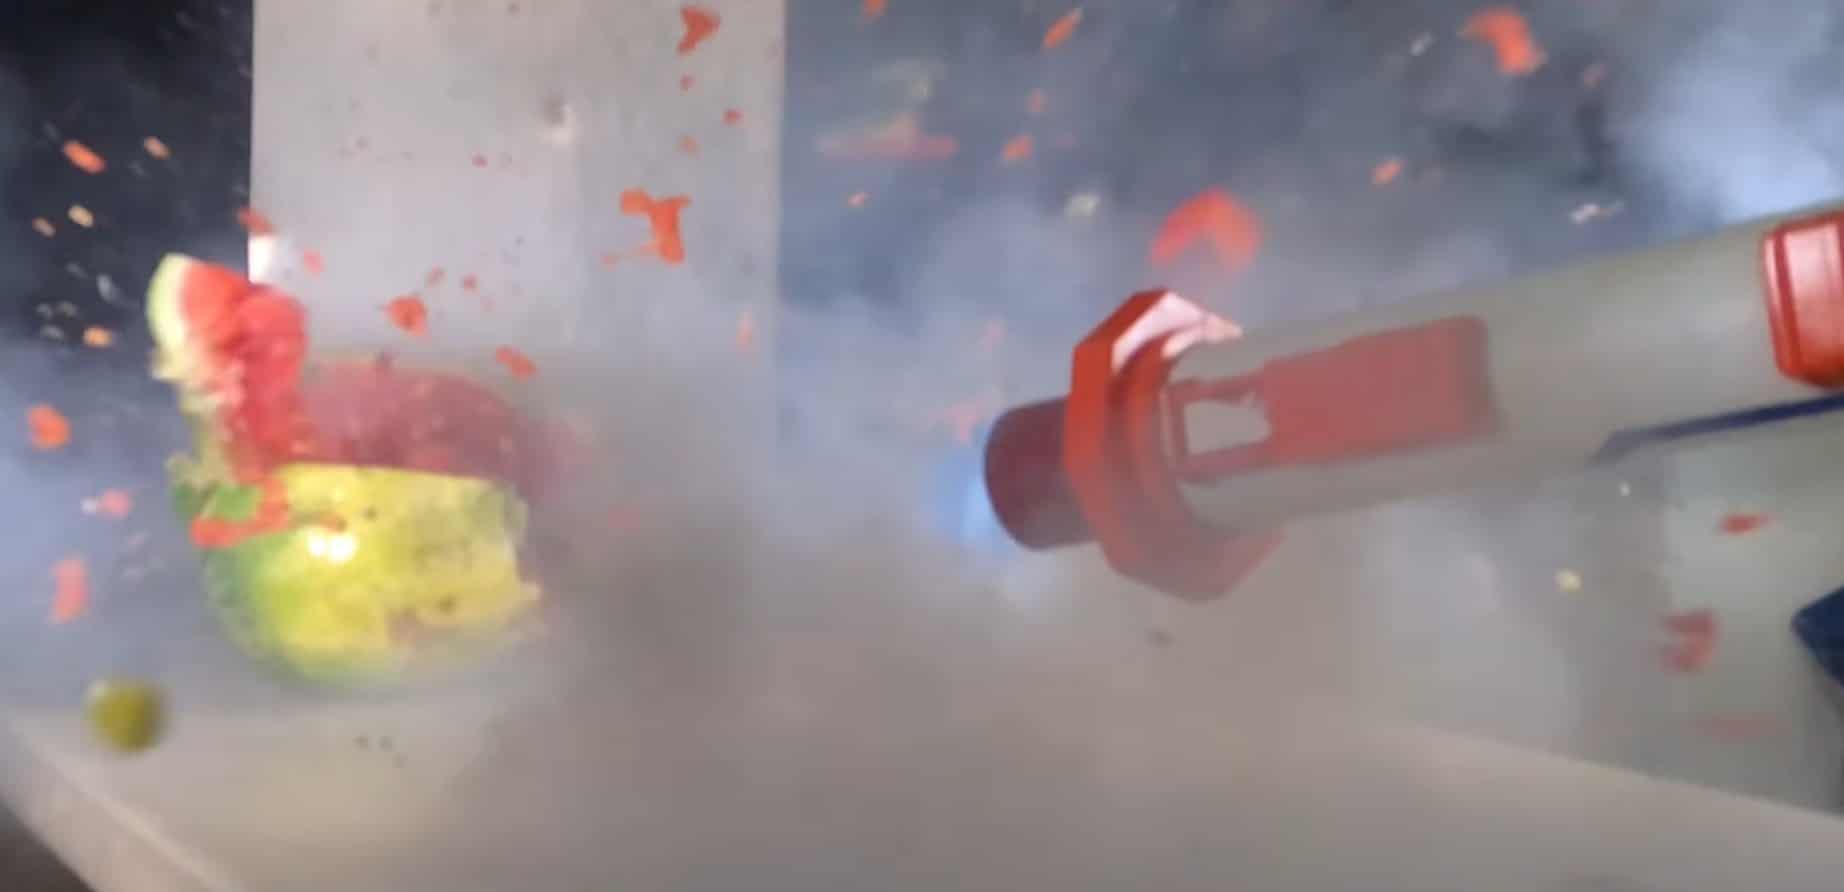 Nerf Rocket Launcher: Riesiger Raktenwerfer im Eigenbau